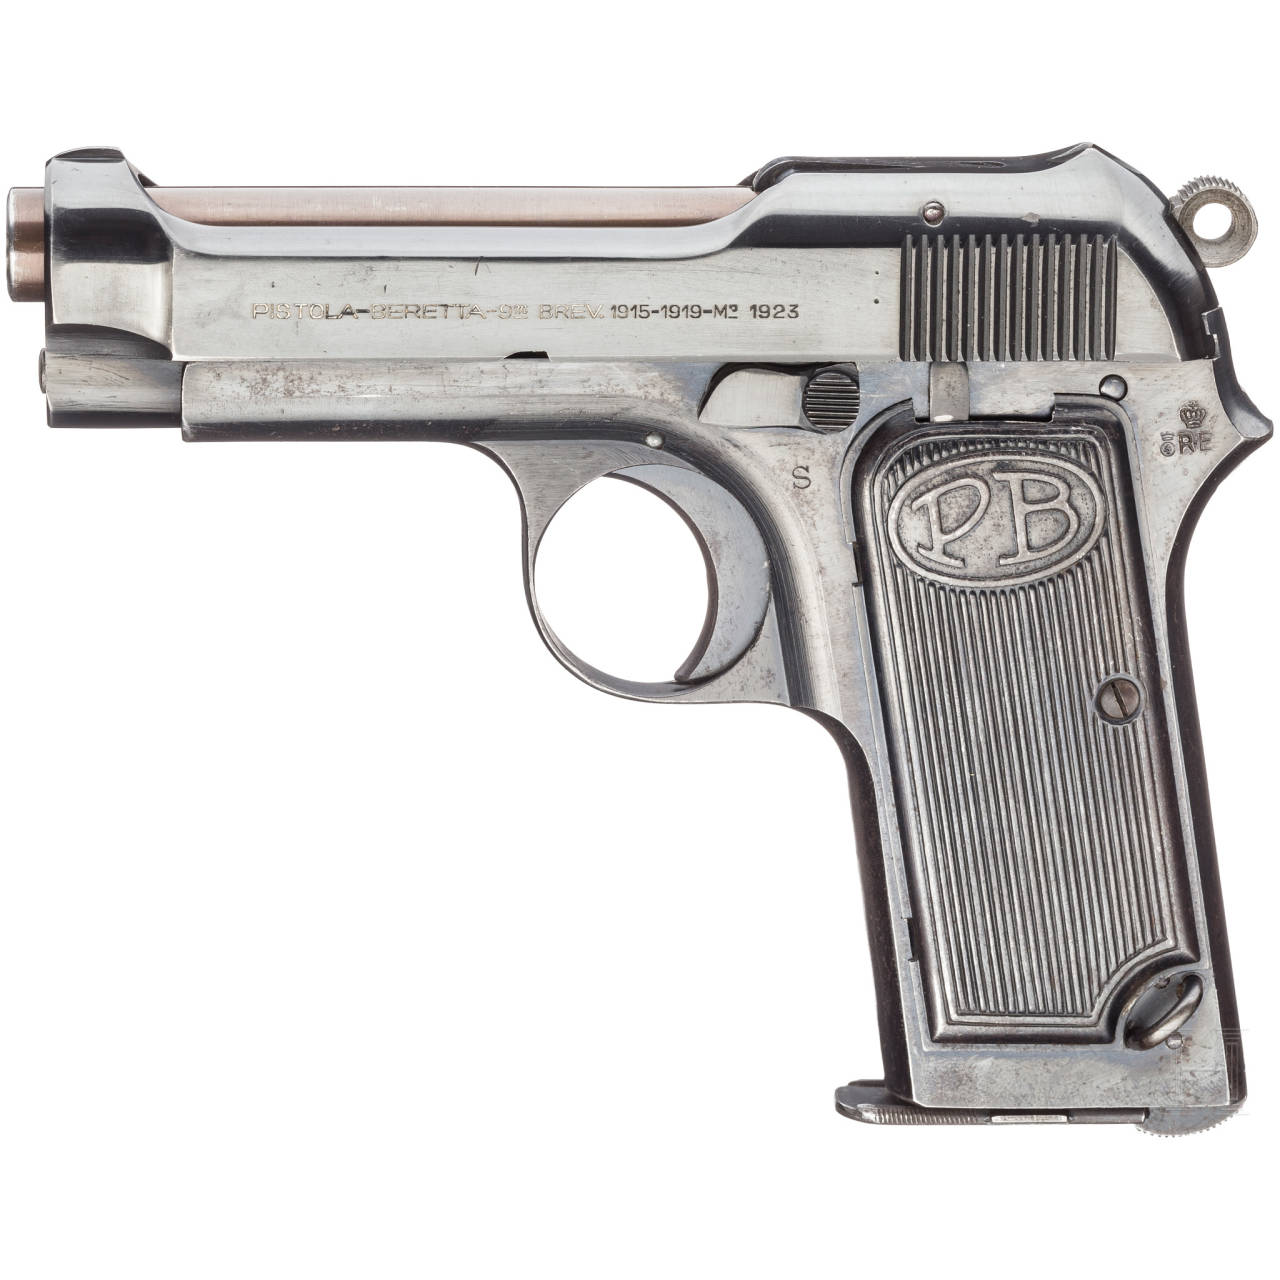 Beretta Mod. 1923, Militär